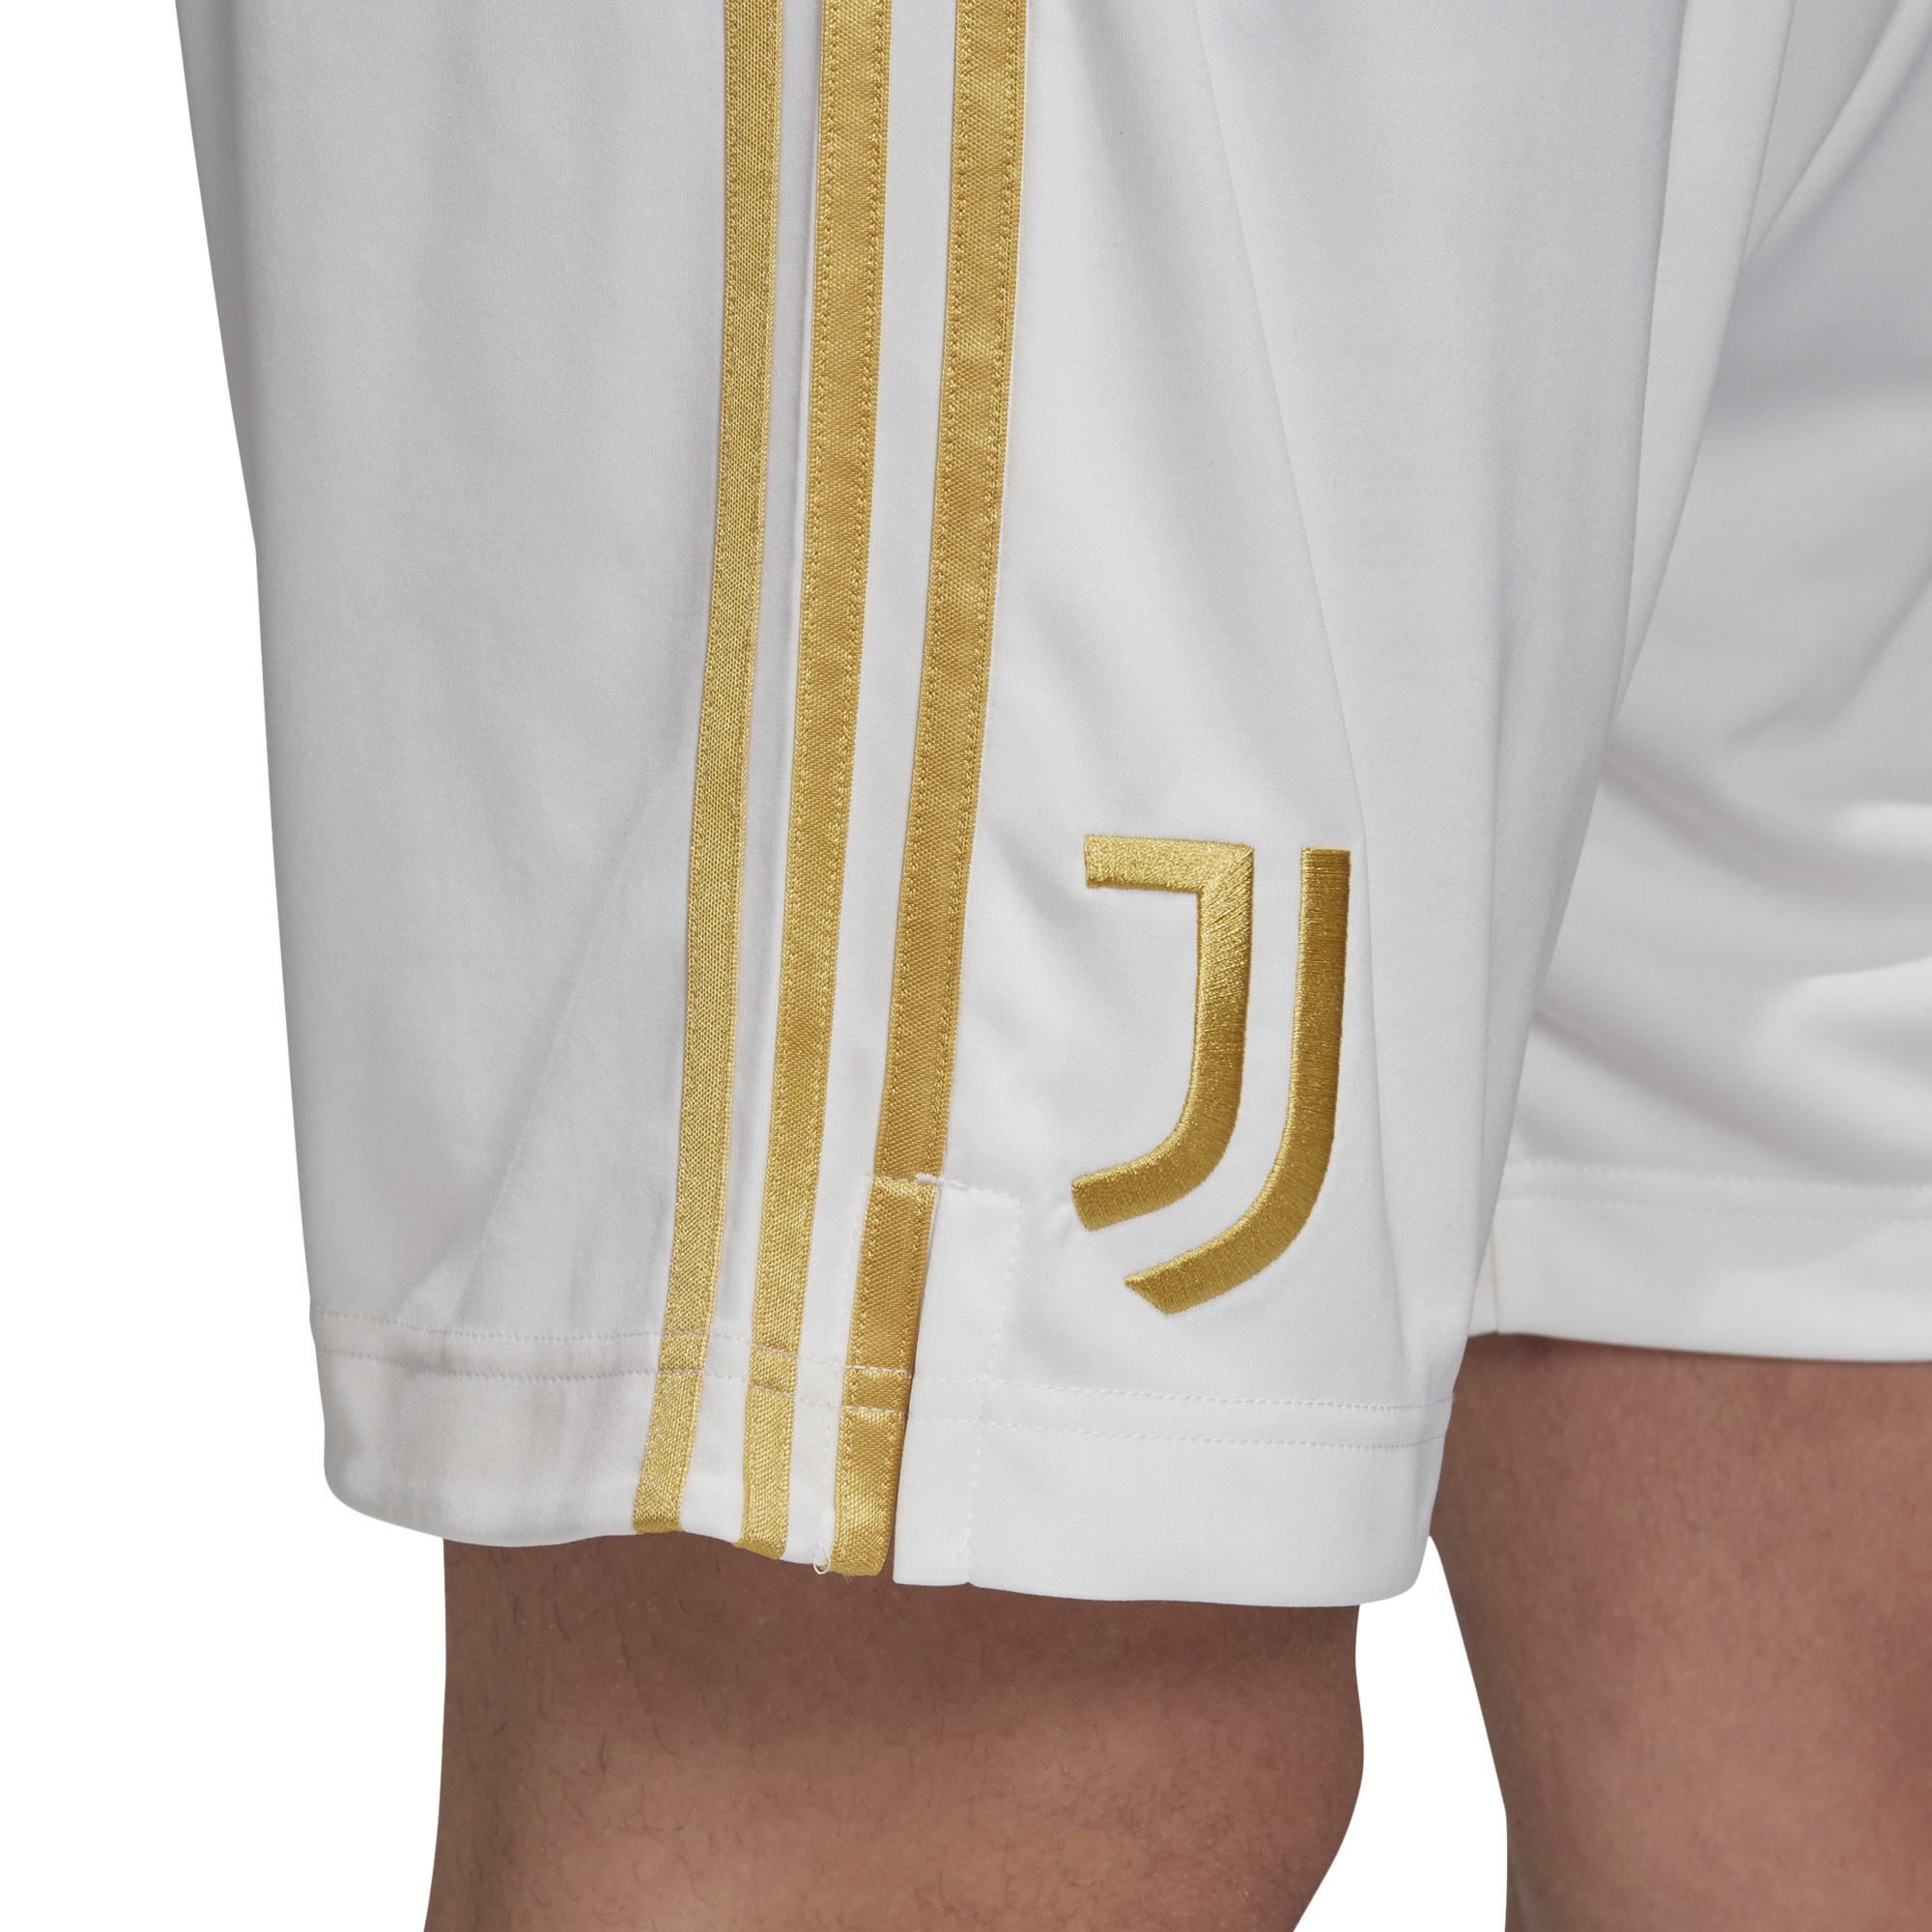 Adidas ADIDAS Juventus Home Short '20-'21